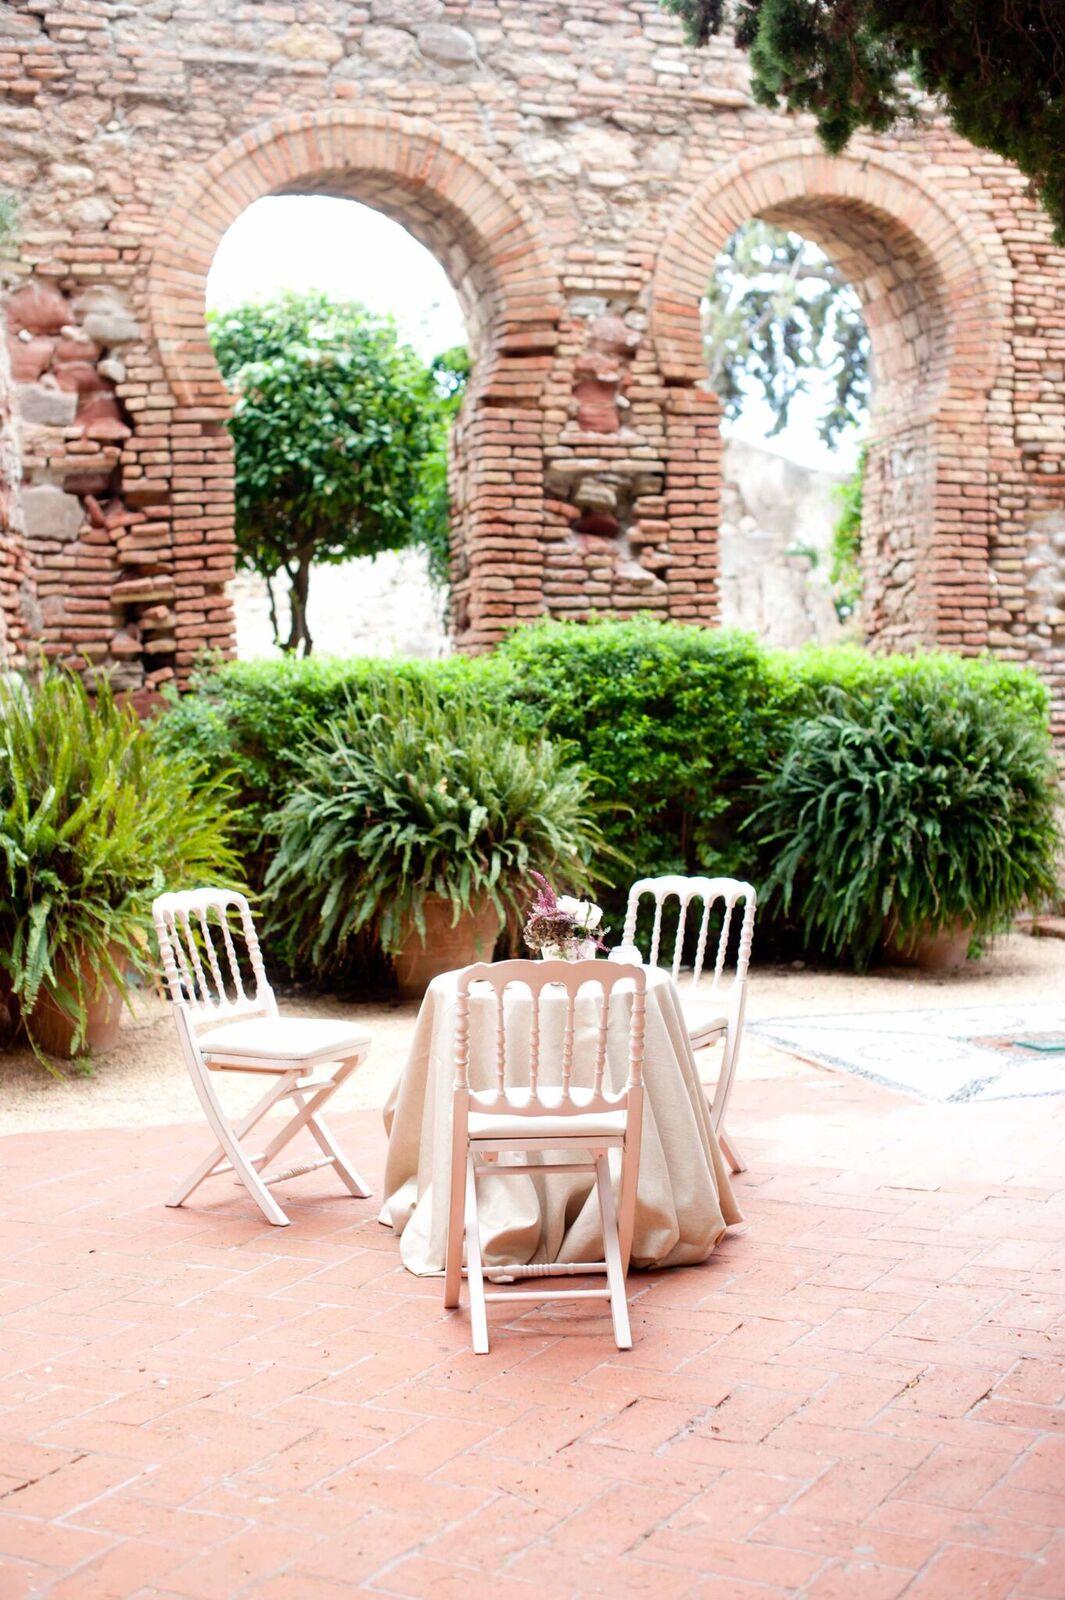 Si-Quiero-Wedding-Planner-Sira-Antequera-Patricia-Javier-014